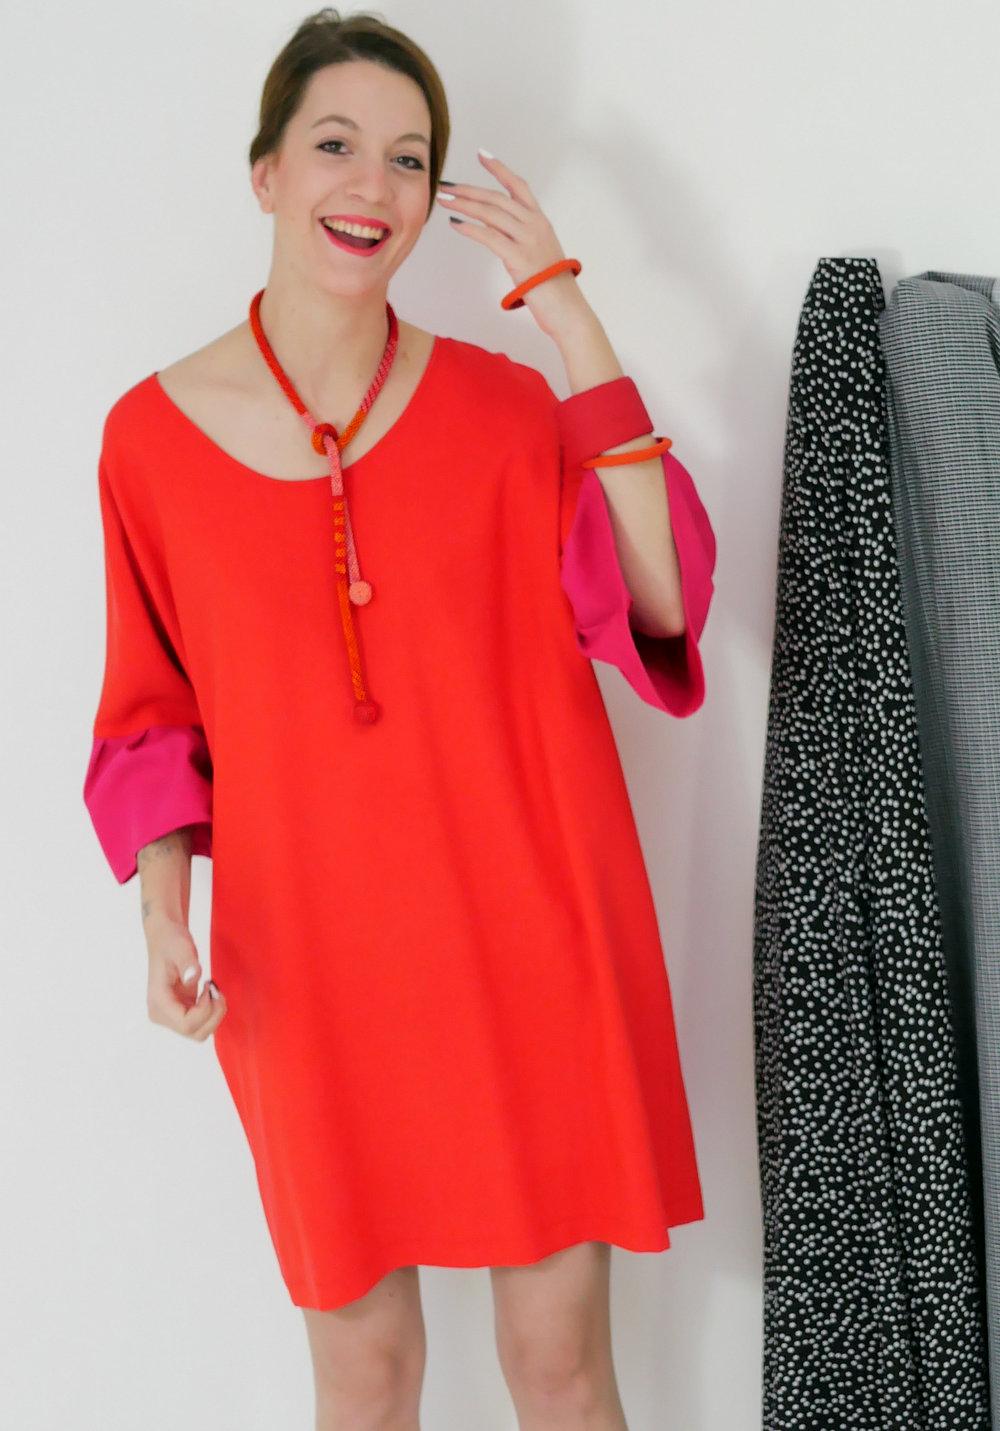 beverly smart d61 tee tunic dress pleated sleeve cuff (1).JPG